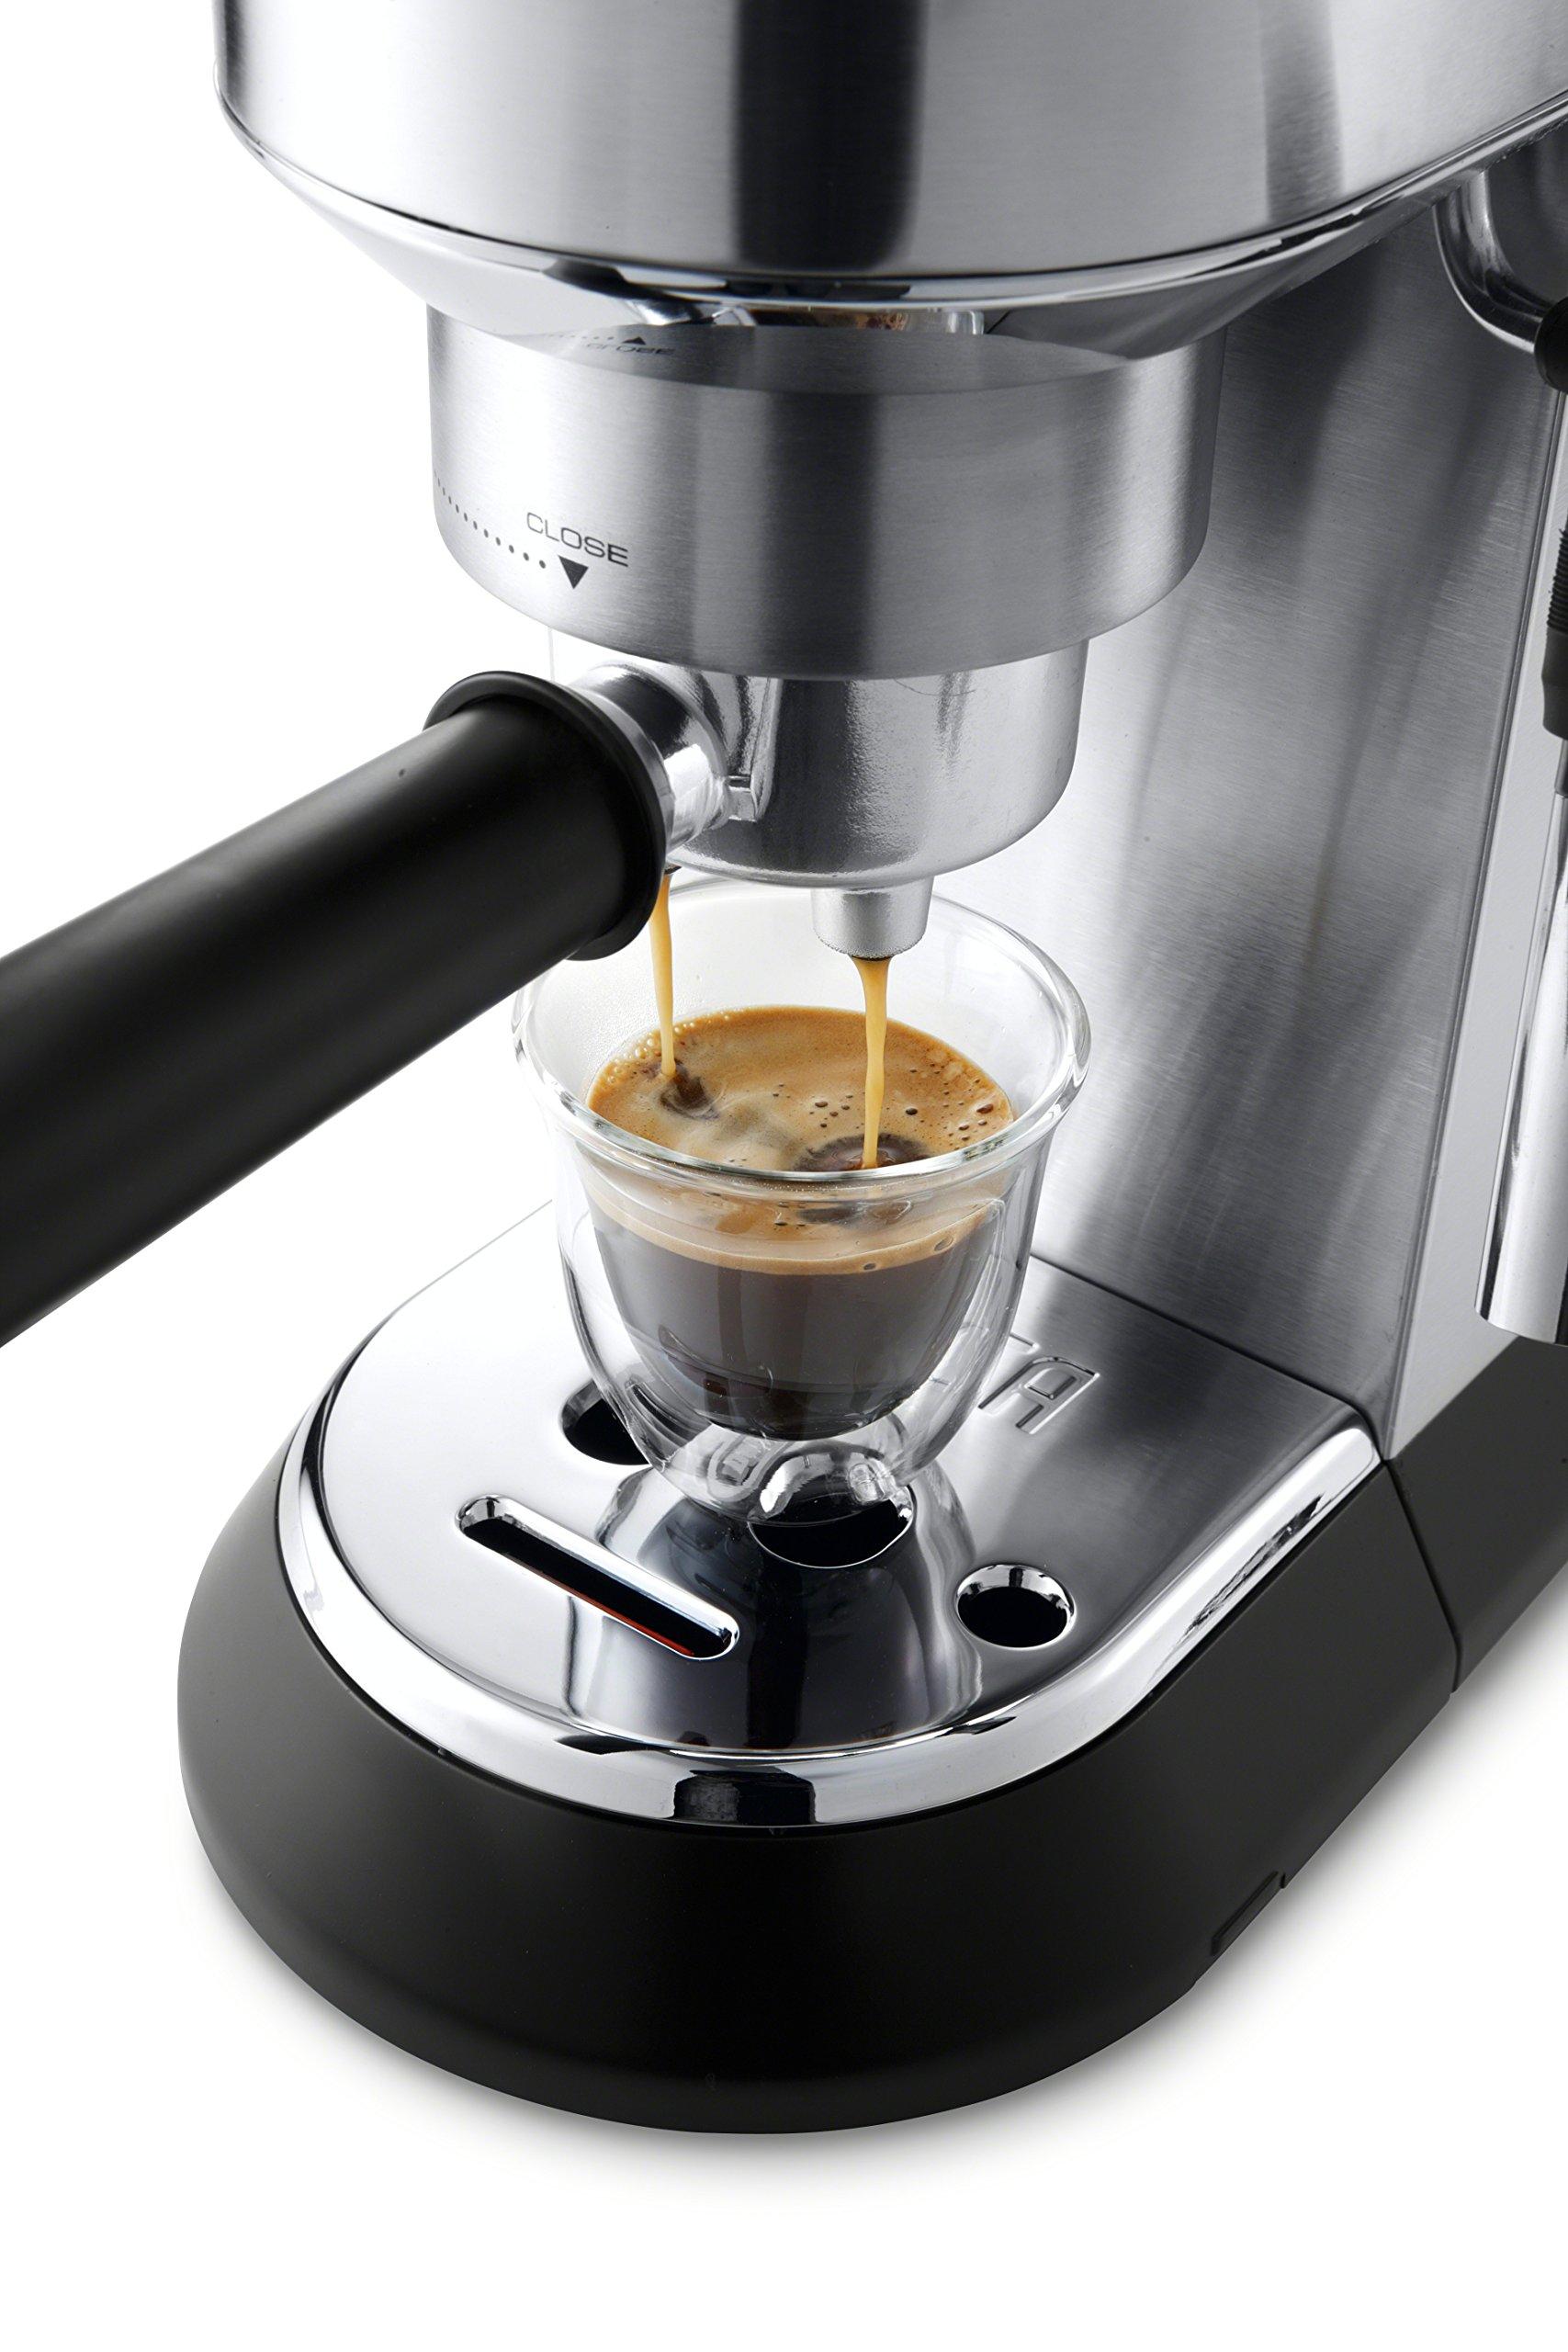 DeLonghi America, Inc EC685M Dedica Deluxe espresso, Silver by DeLonghi America, Inc (Image #5)